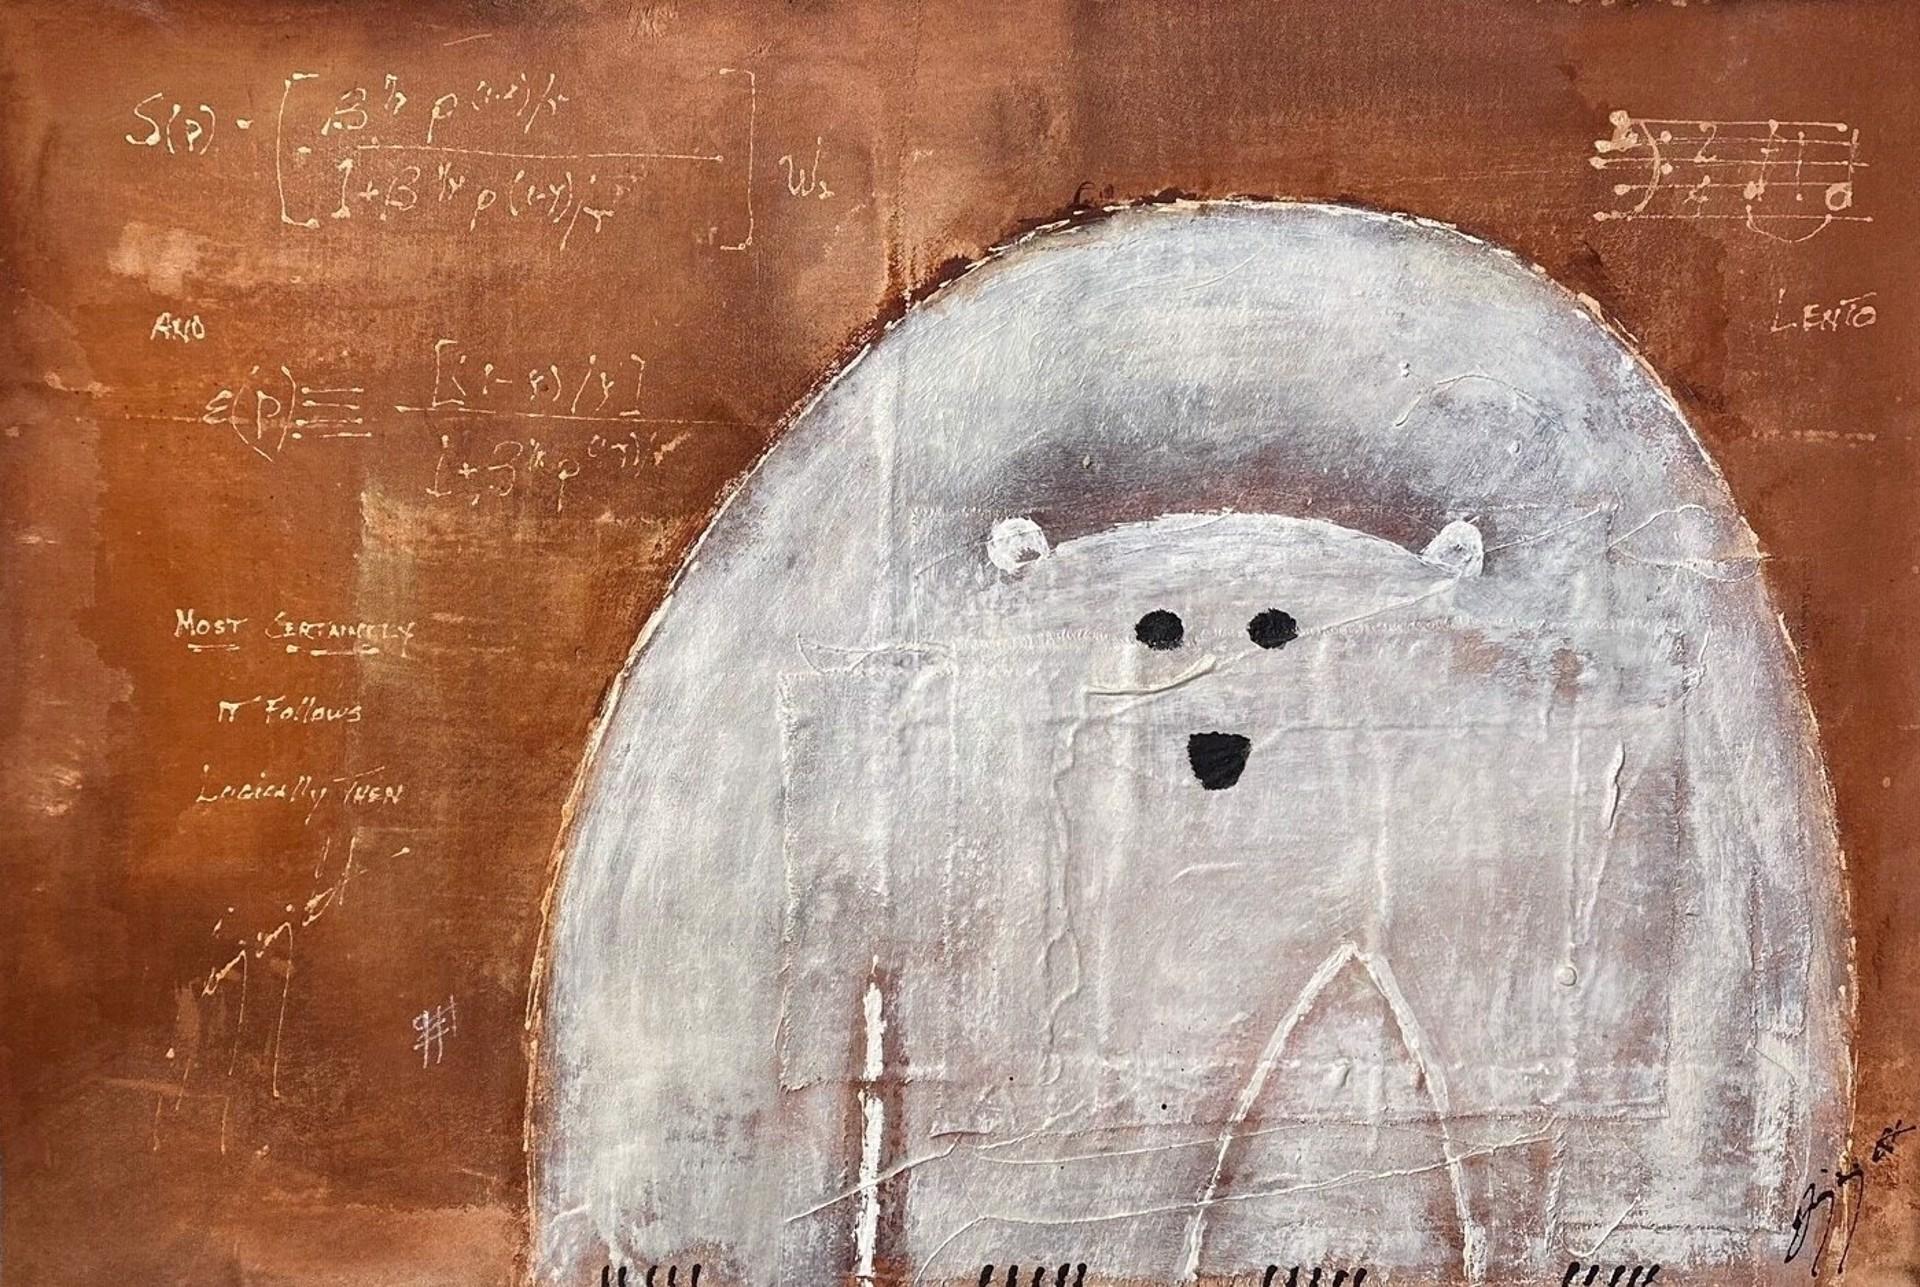 Jimmy Wright - Lento by Historical Art